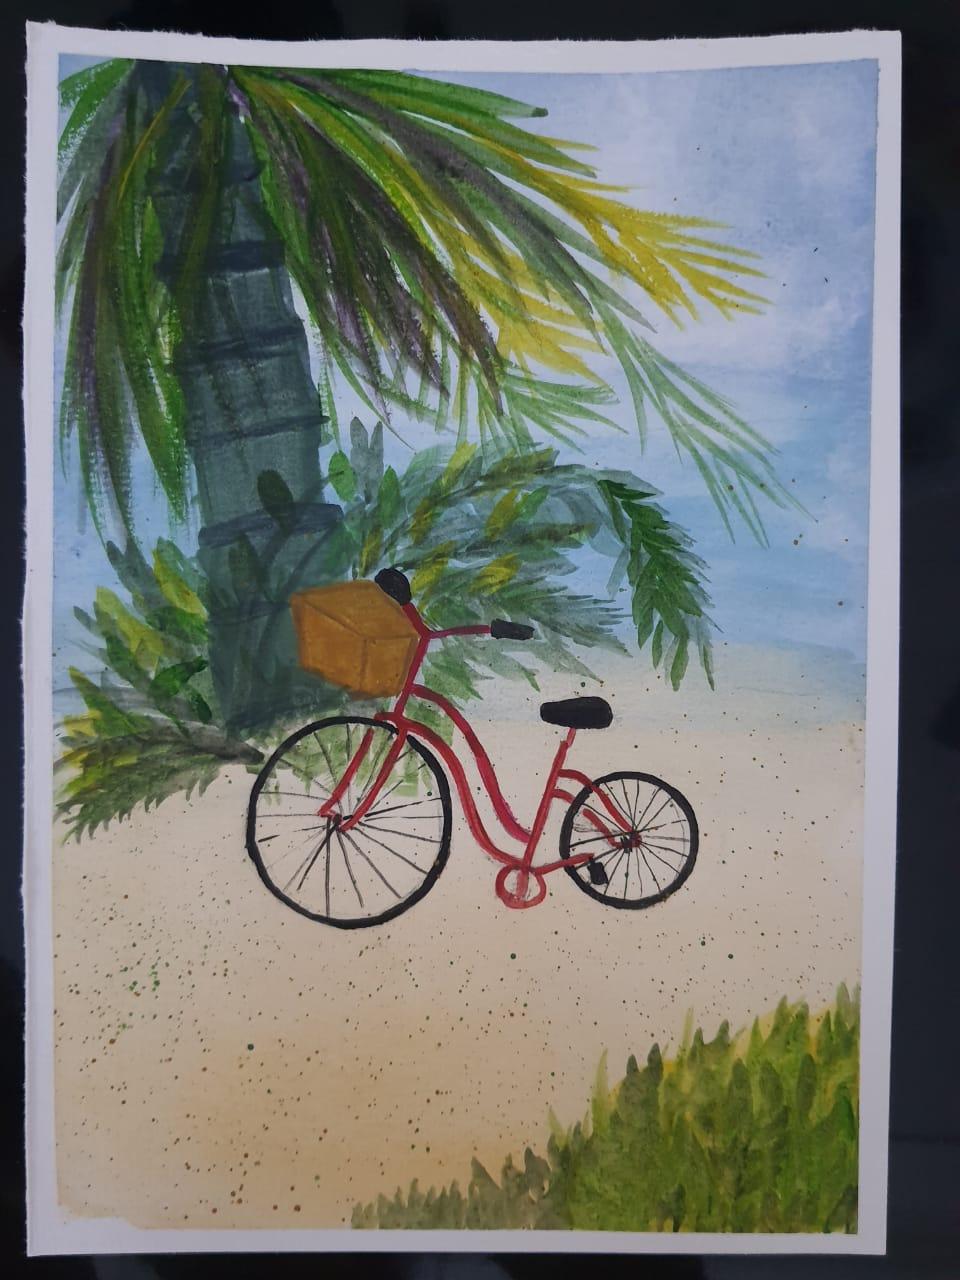 Painting by Geetika Mishra